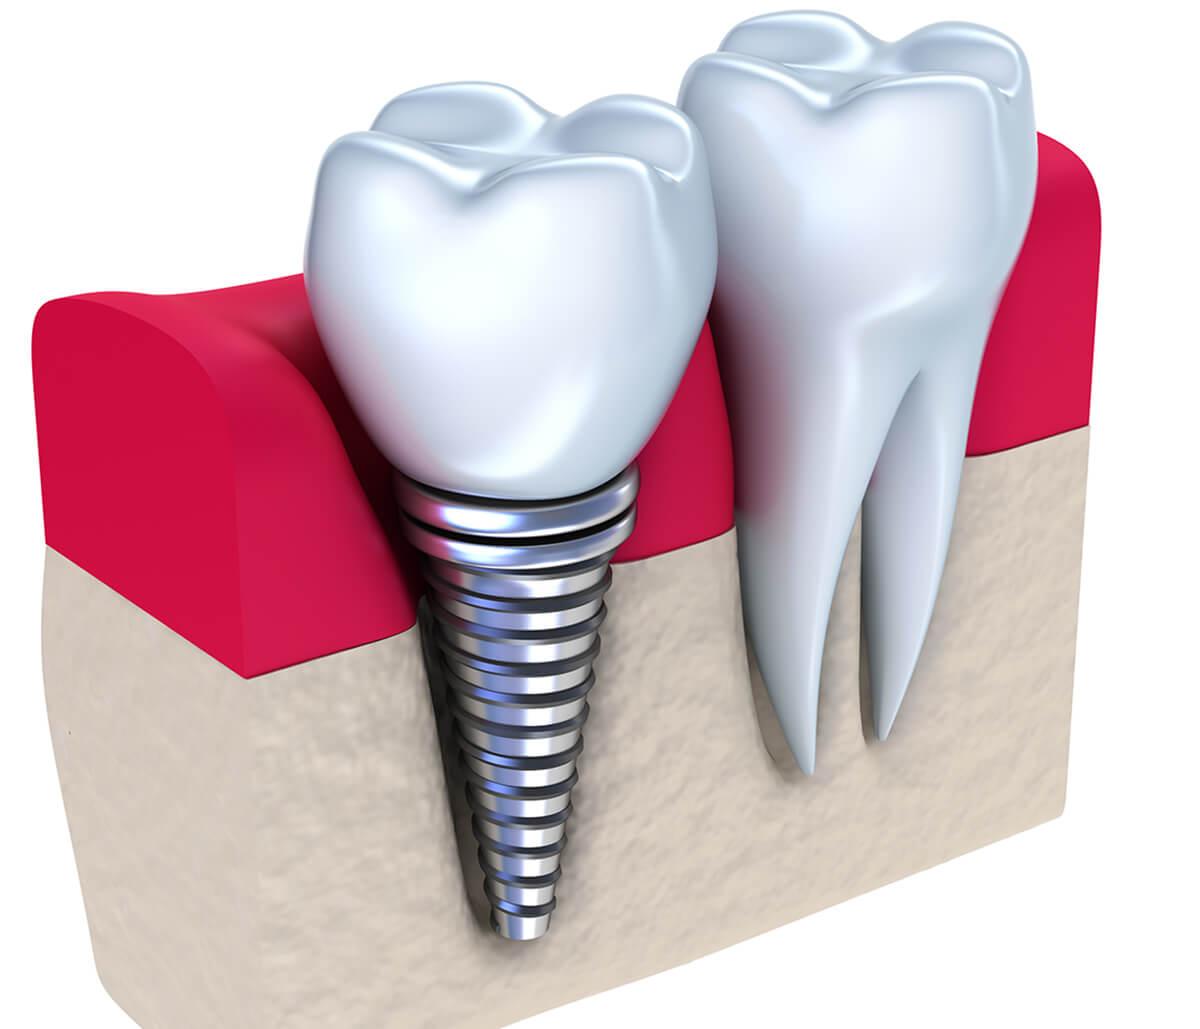 Cost of Dental Implants AT Peninsula Dental Implant Center IN Menlo Park Area